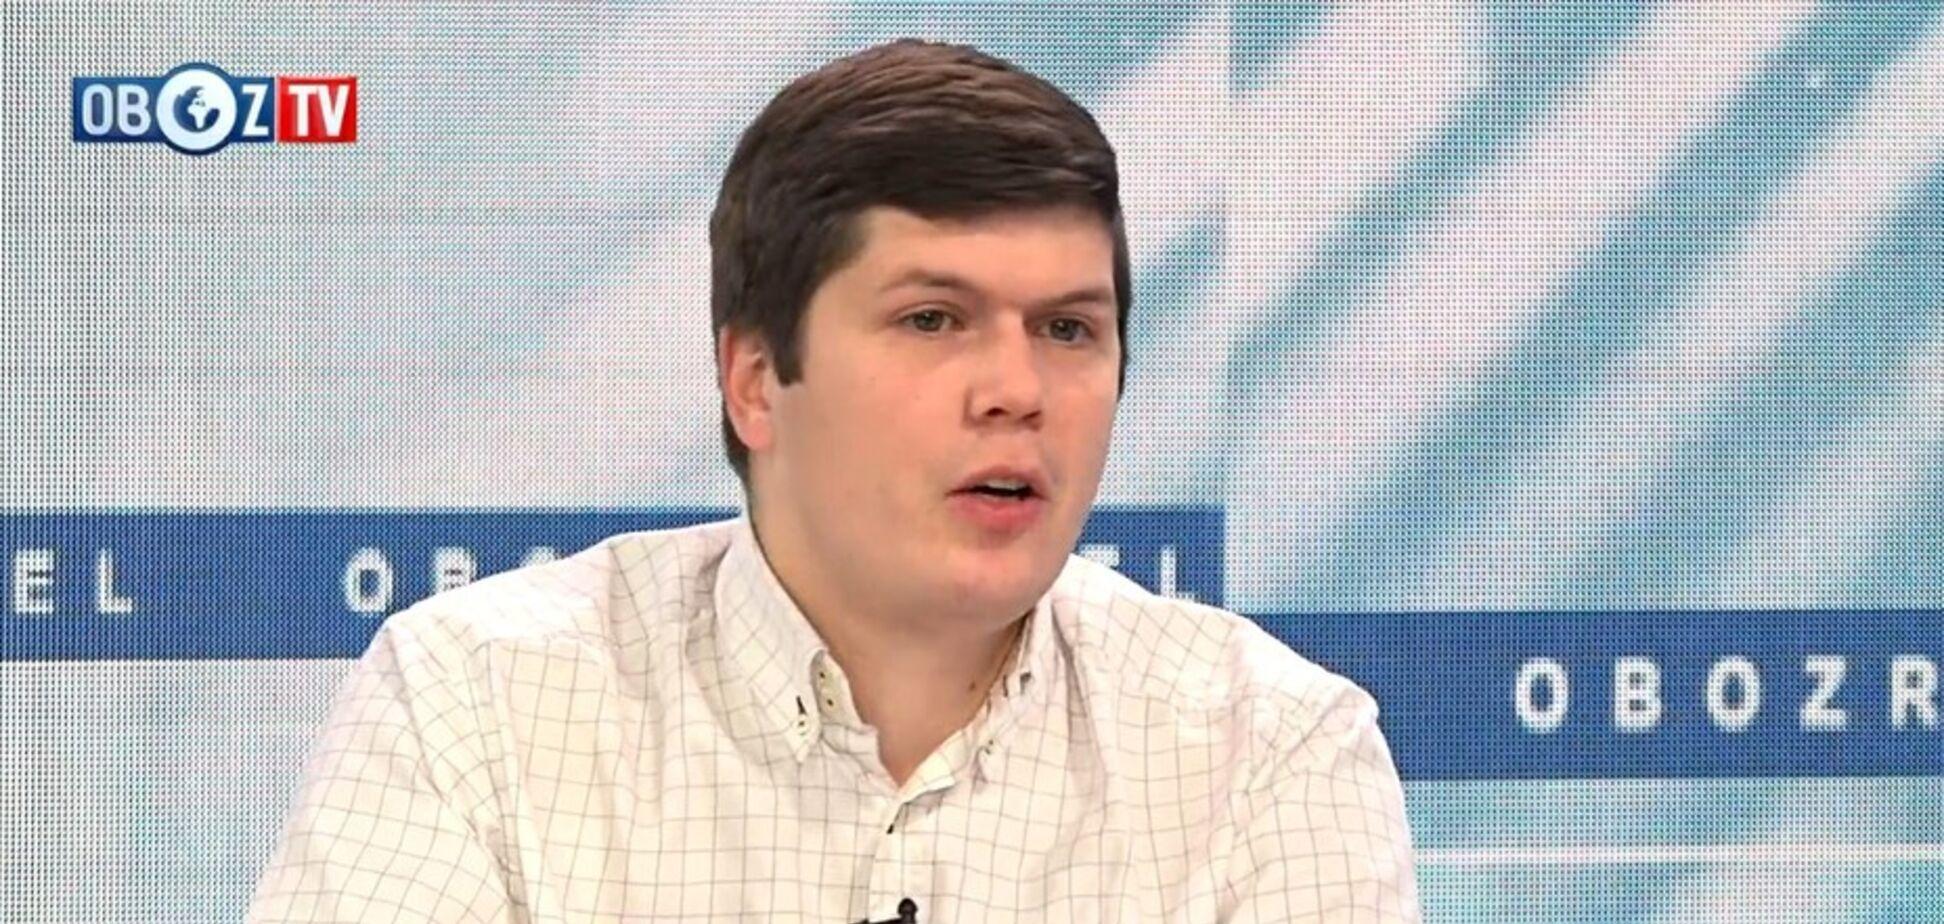 Закони по захисту тварин в Україні не діють: засновник руху UANIMALS